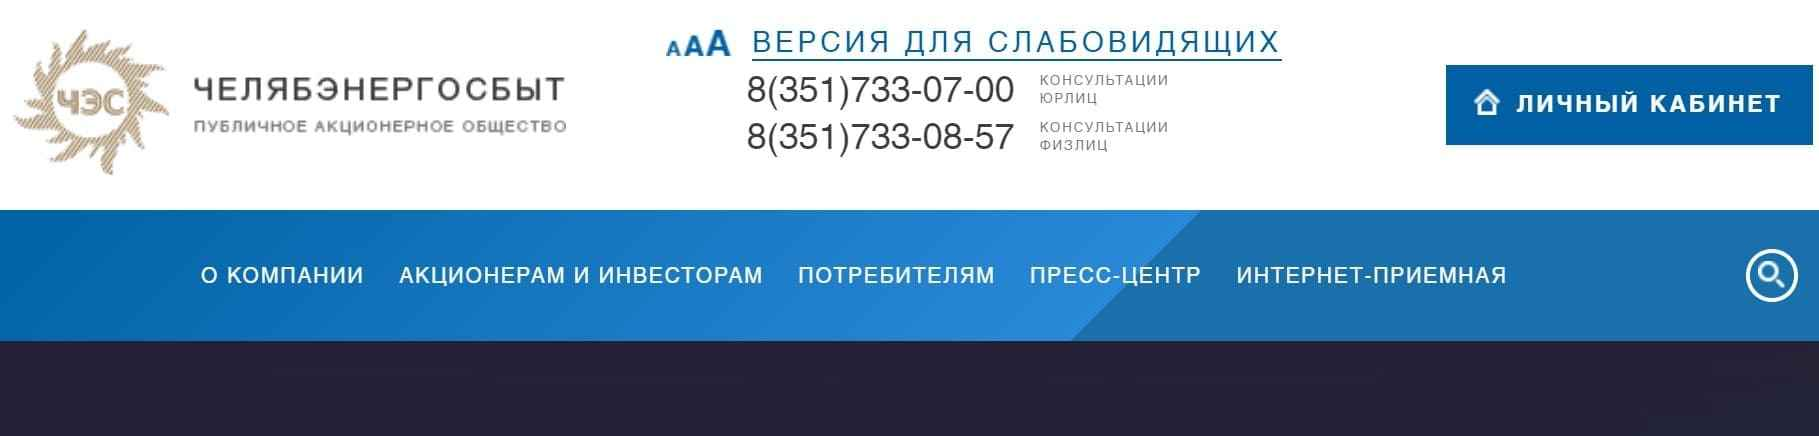 ЧелябЭнергосбыт сайт